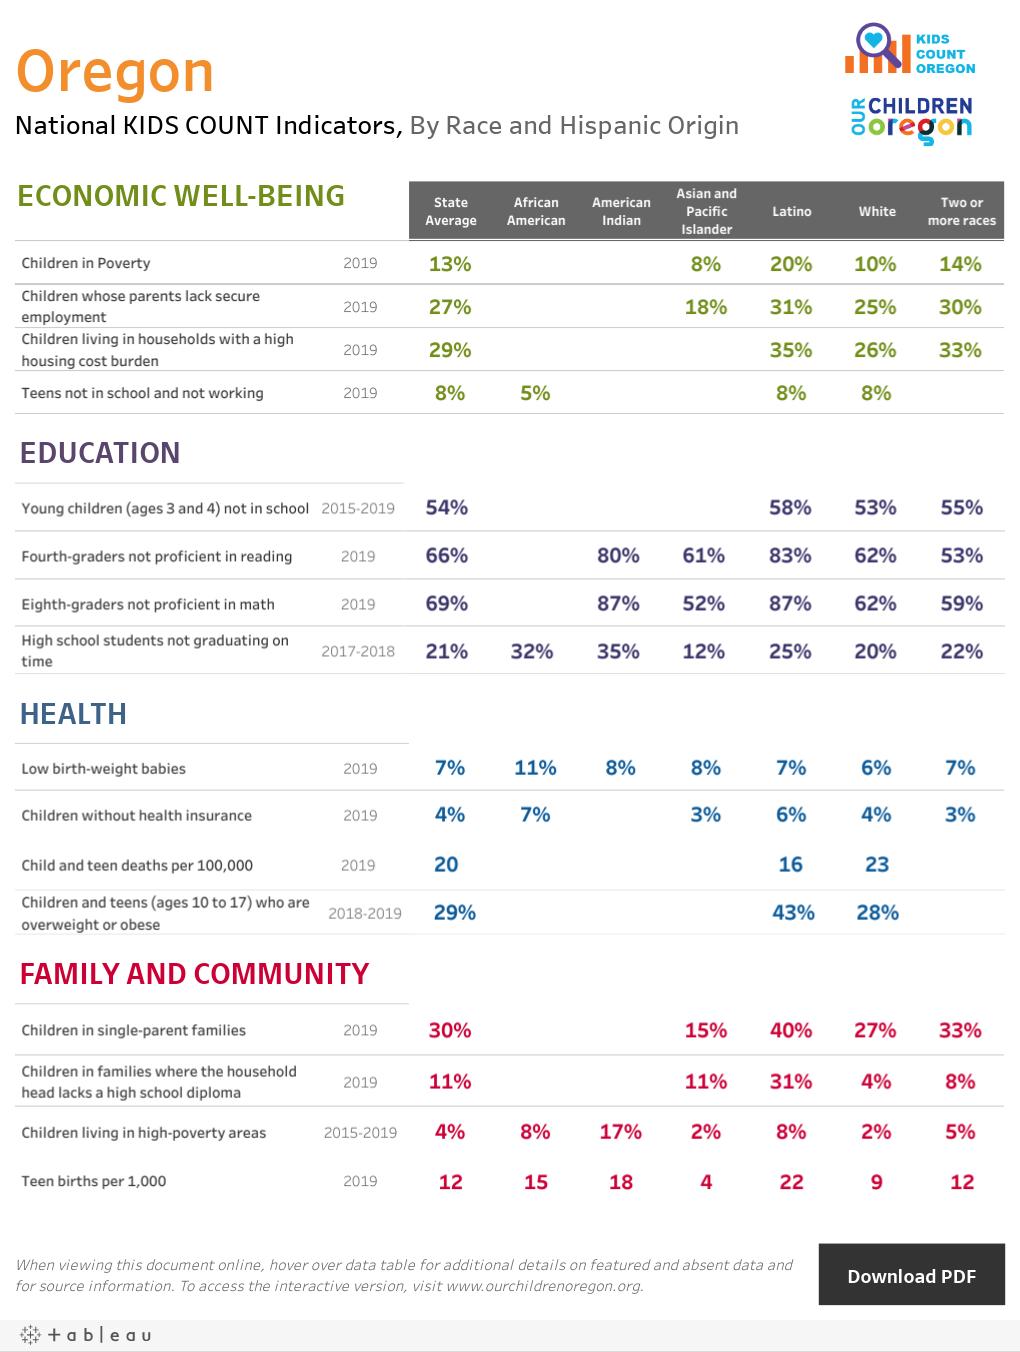 OregonNational KIDS COUNT Indicators, By Race and Hispanic Origin